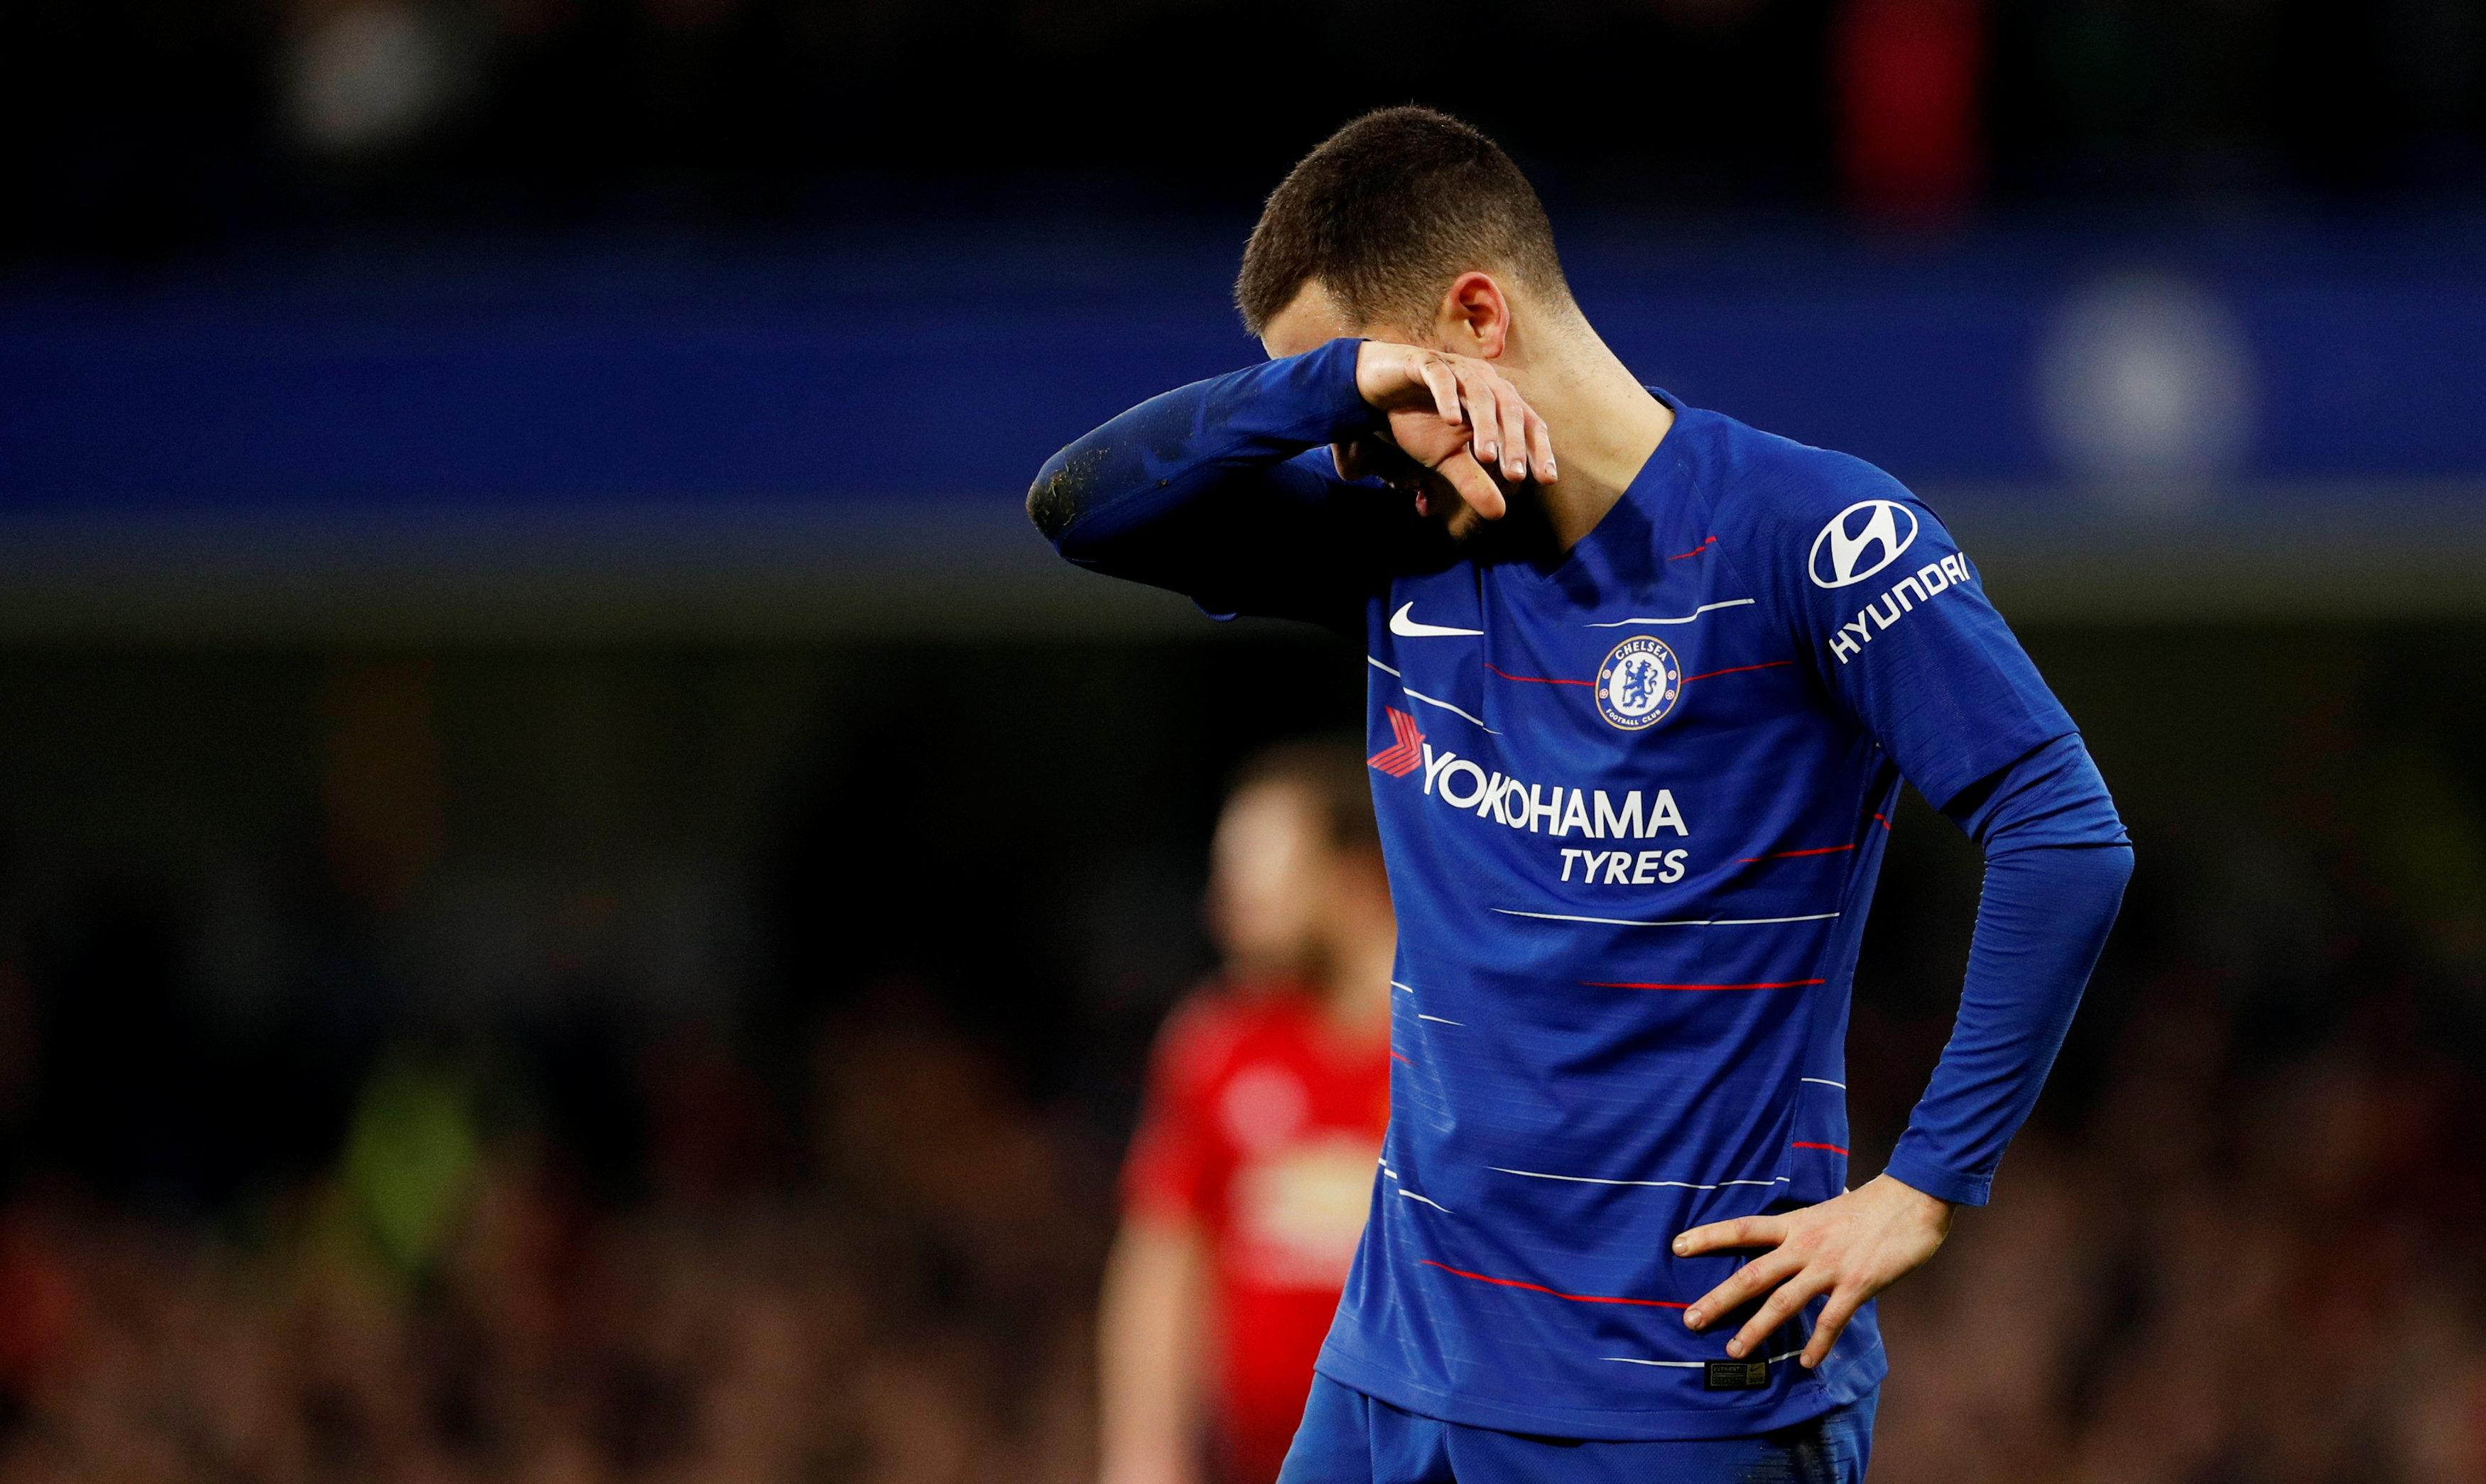 Football - Etranger - Coup de tonnerre, Chelsea interdit de recrutement par la Fifa